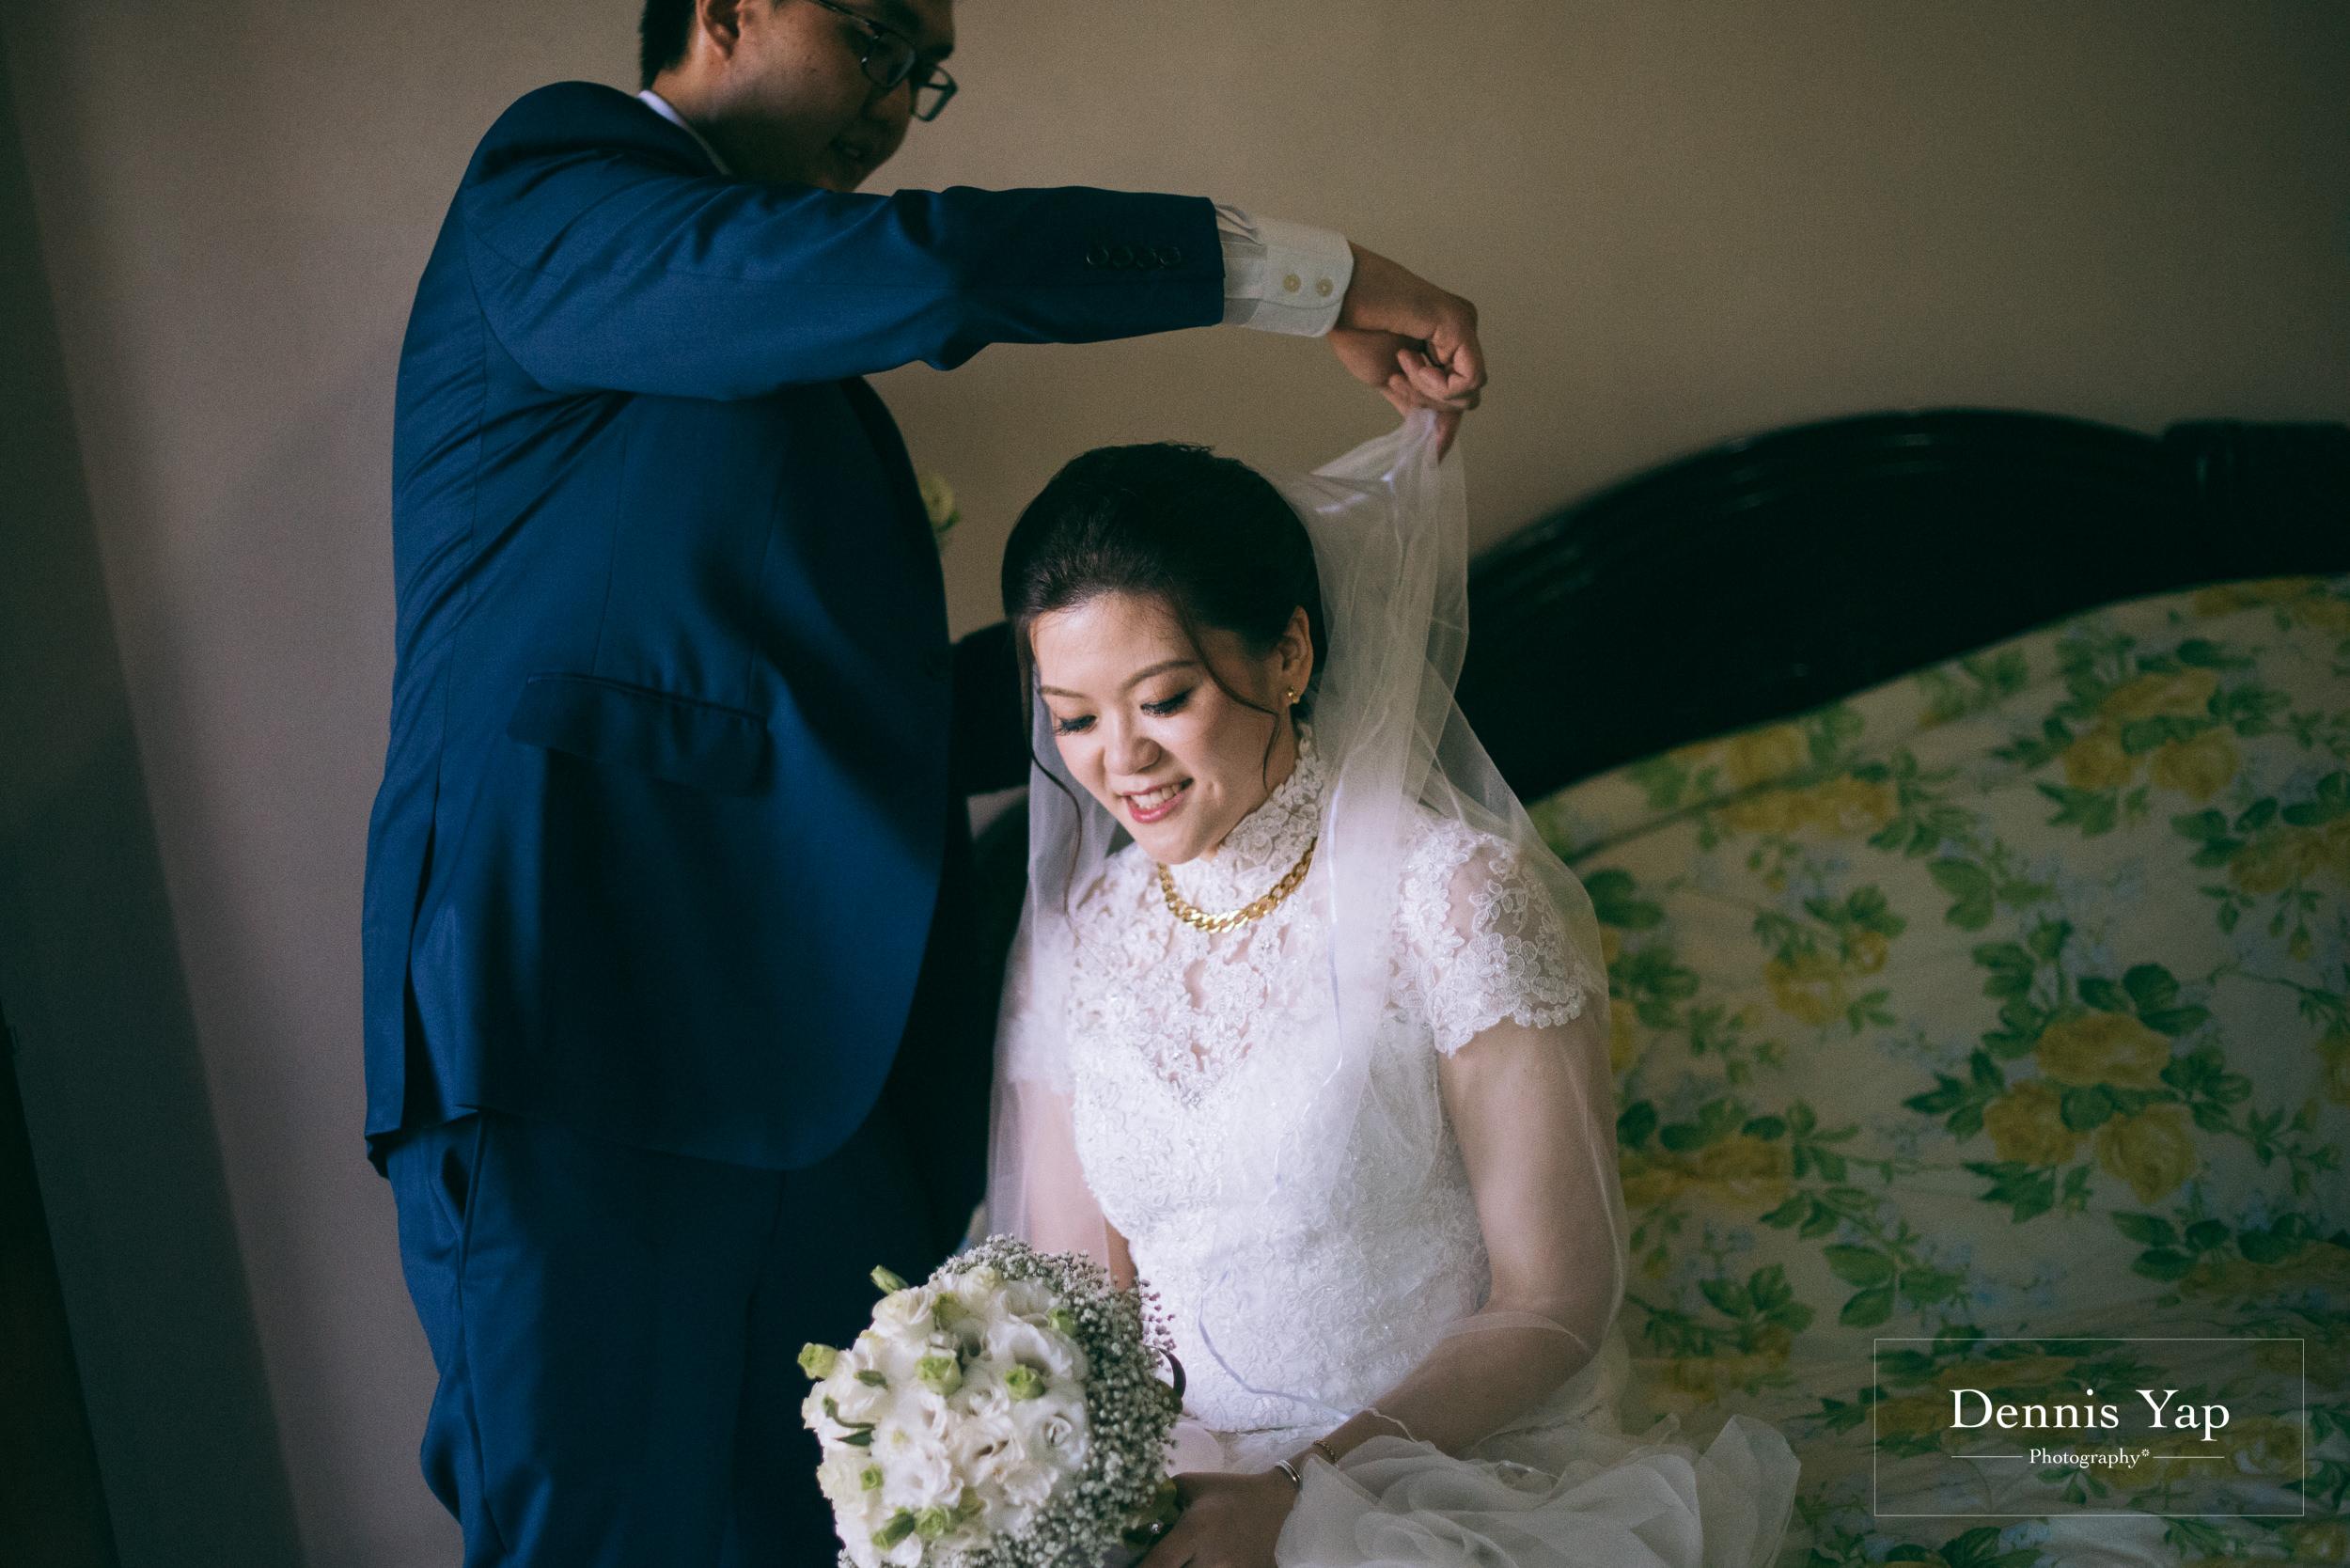 kok jin hooi woon wedding day klang dennis yap photography-11.jpg